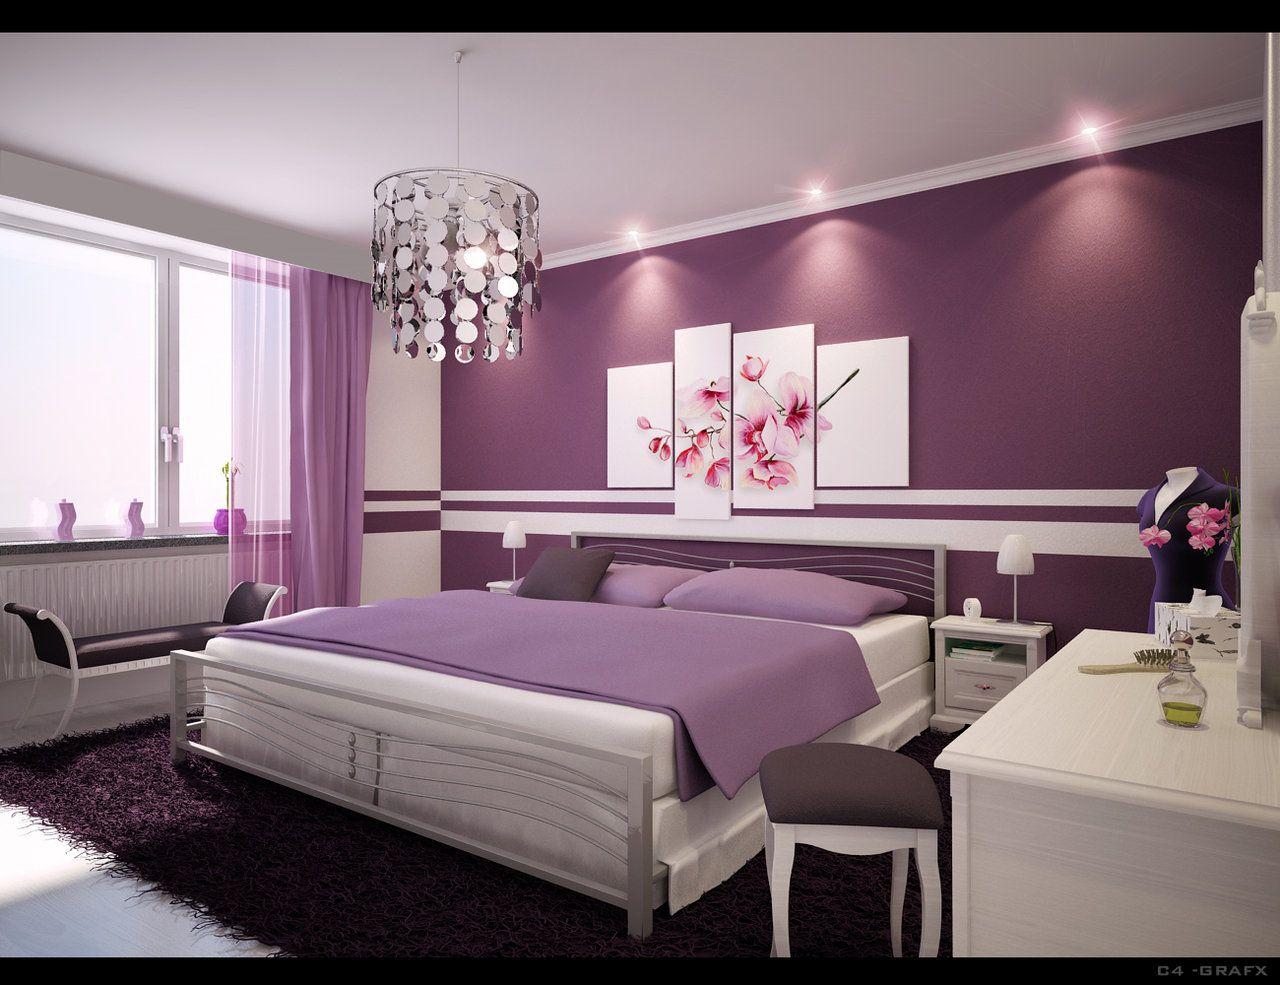 Badezimmerdesign bangladesch dj ruby ray rubyraybd on pinterest